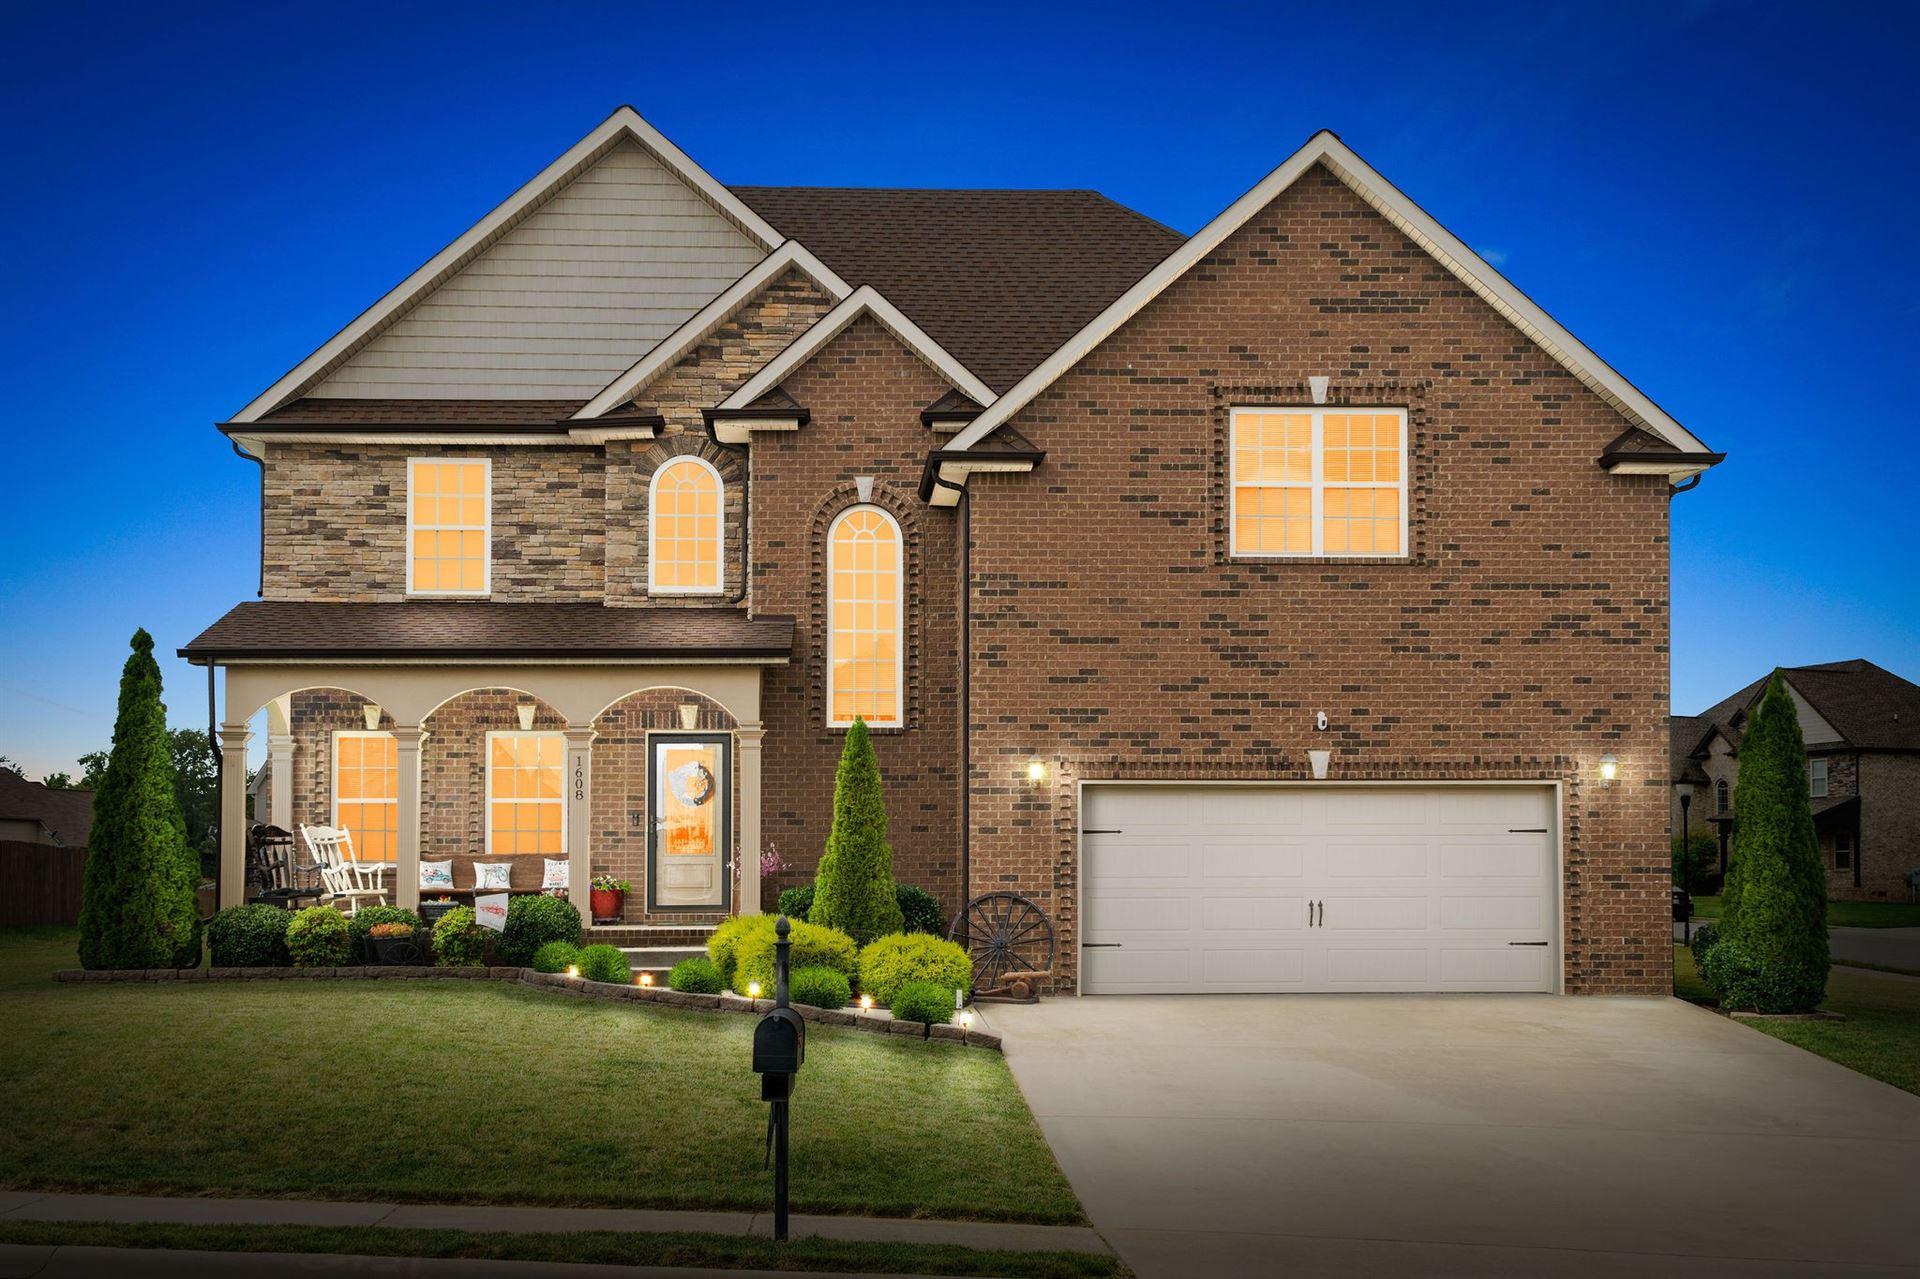 1608 Edgewater Ln, Clarksville, TN 37043 - MLS#: 2268640